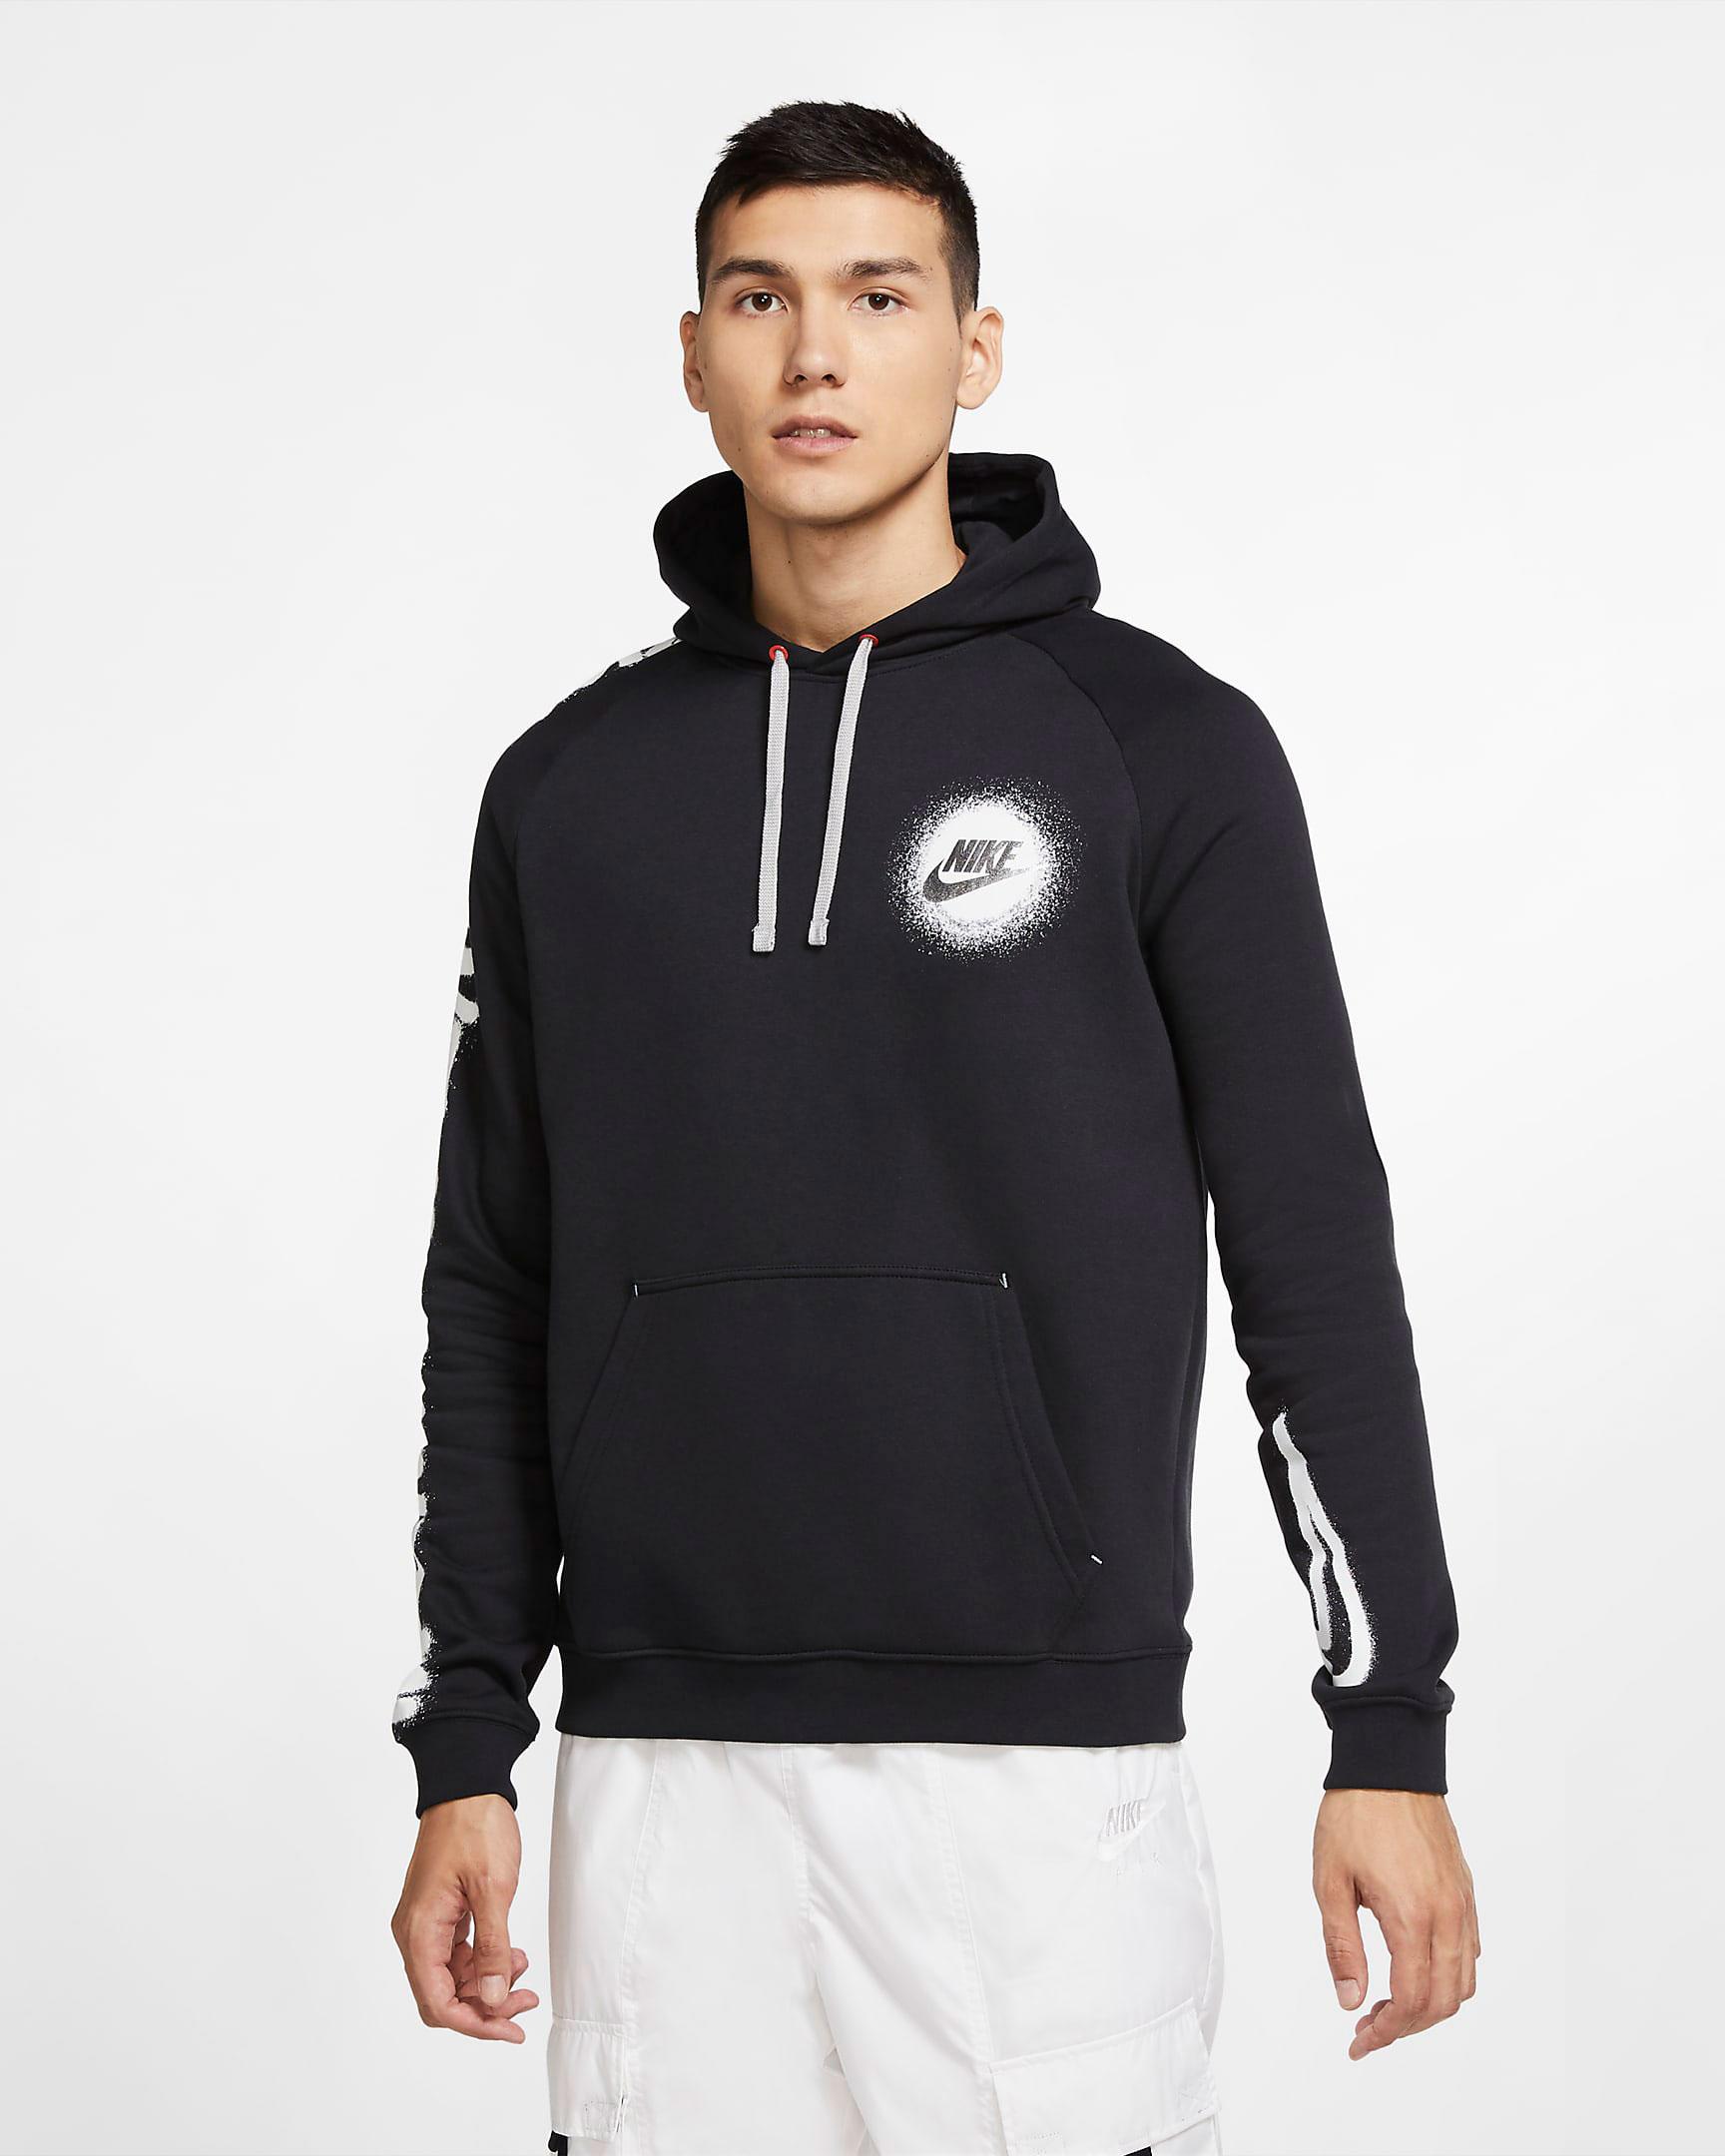 nike-sportswear-spray-paint-club-hoodie-black-4